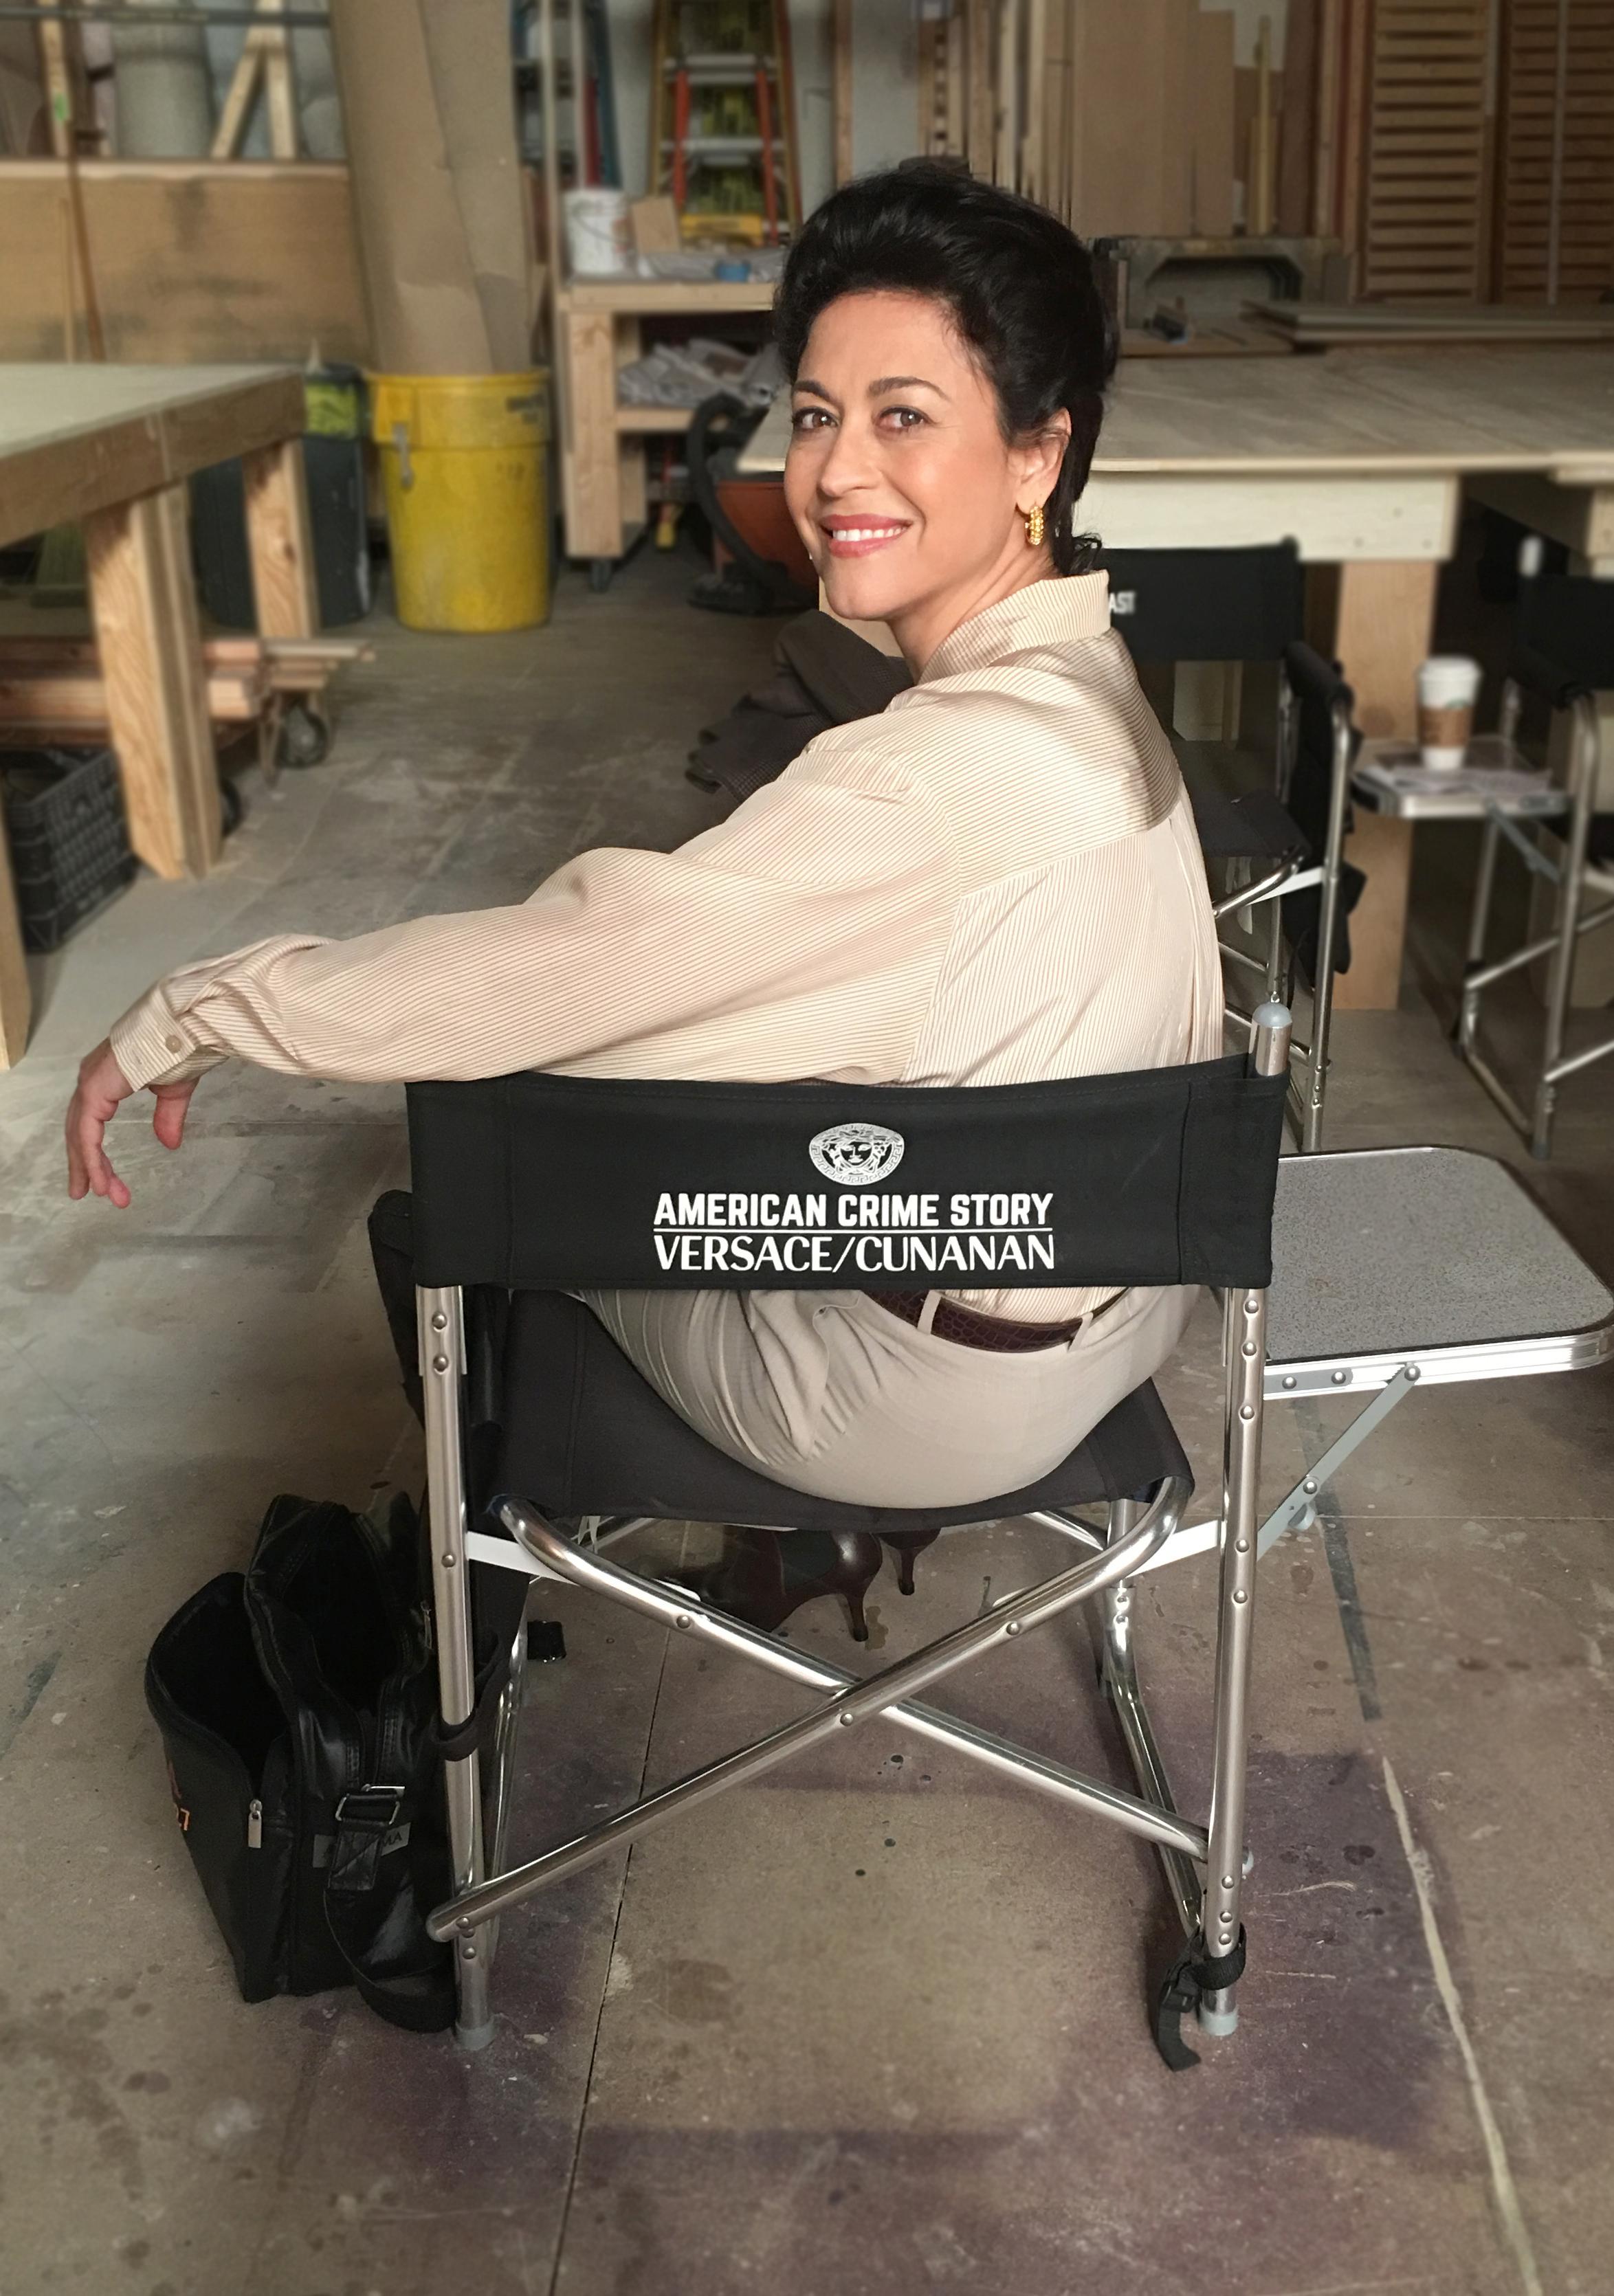 Fabiana-behind-scenes-1.jpg